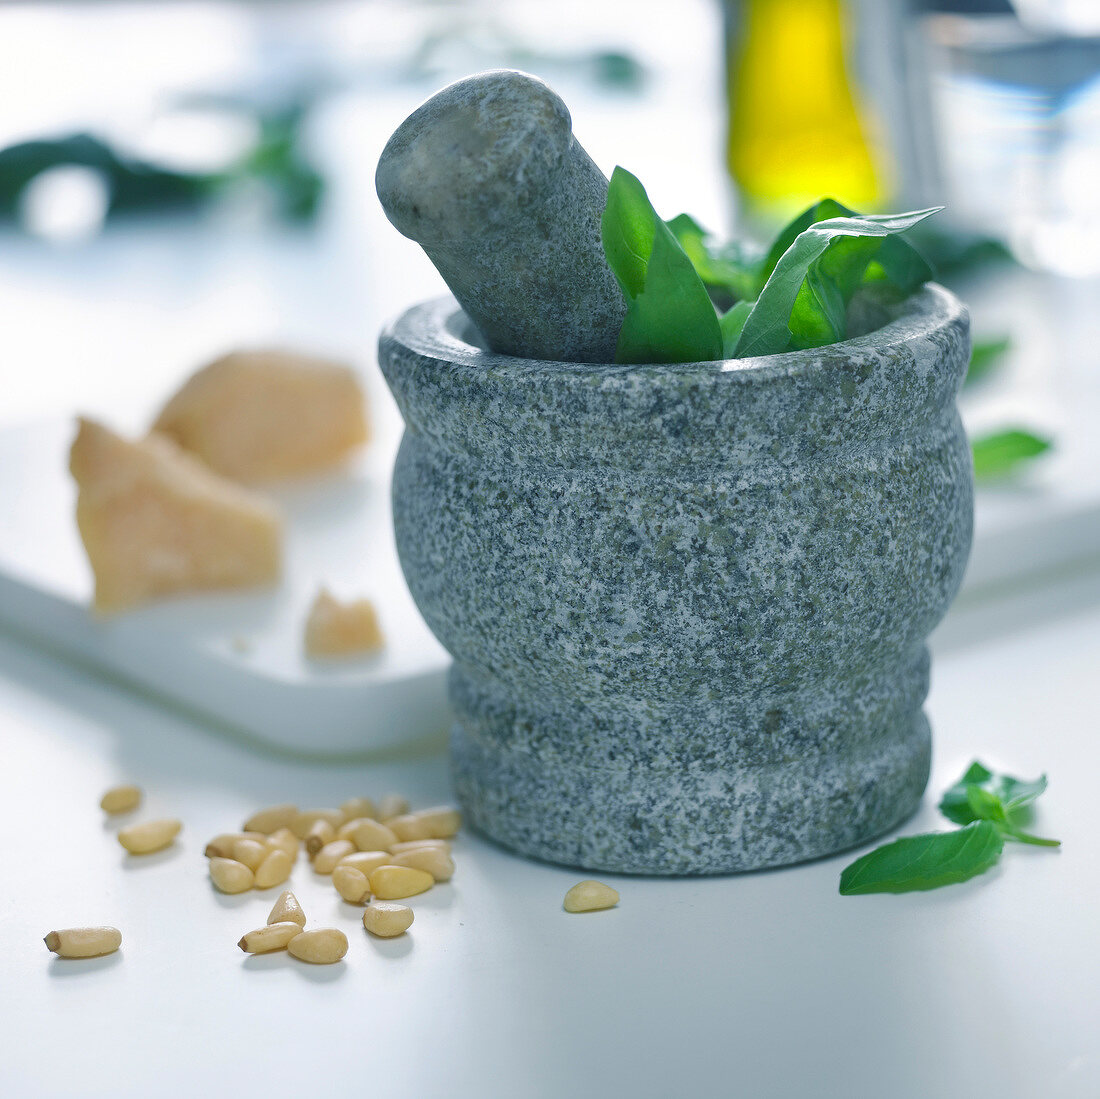 Preparing pesto sauce with pestle and mortar